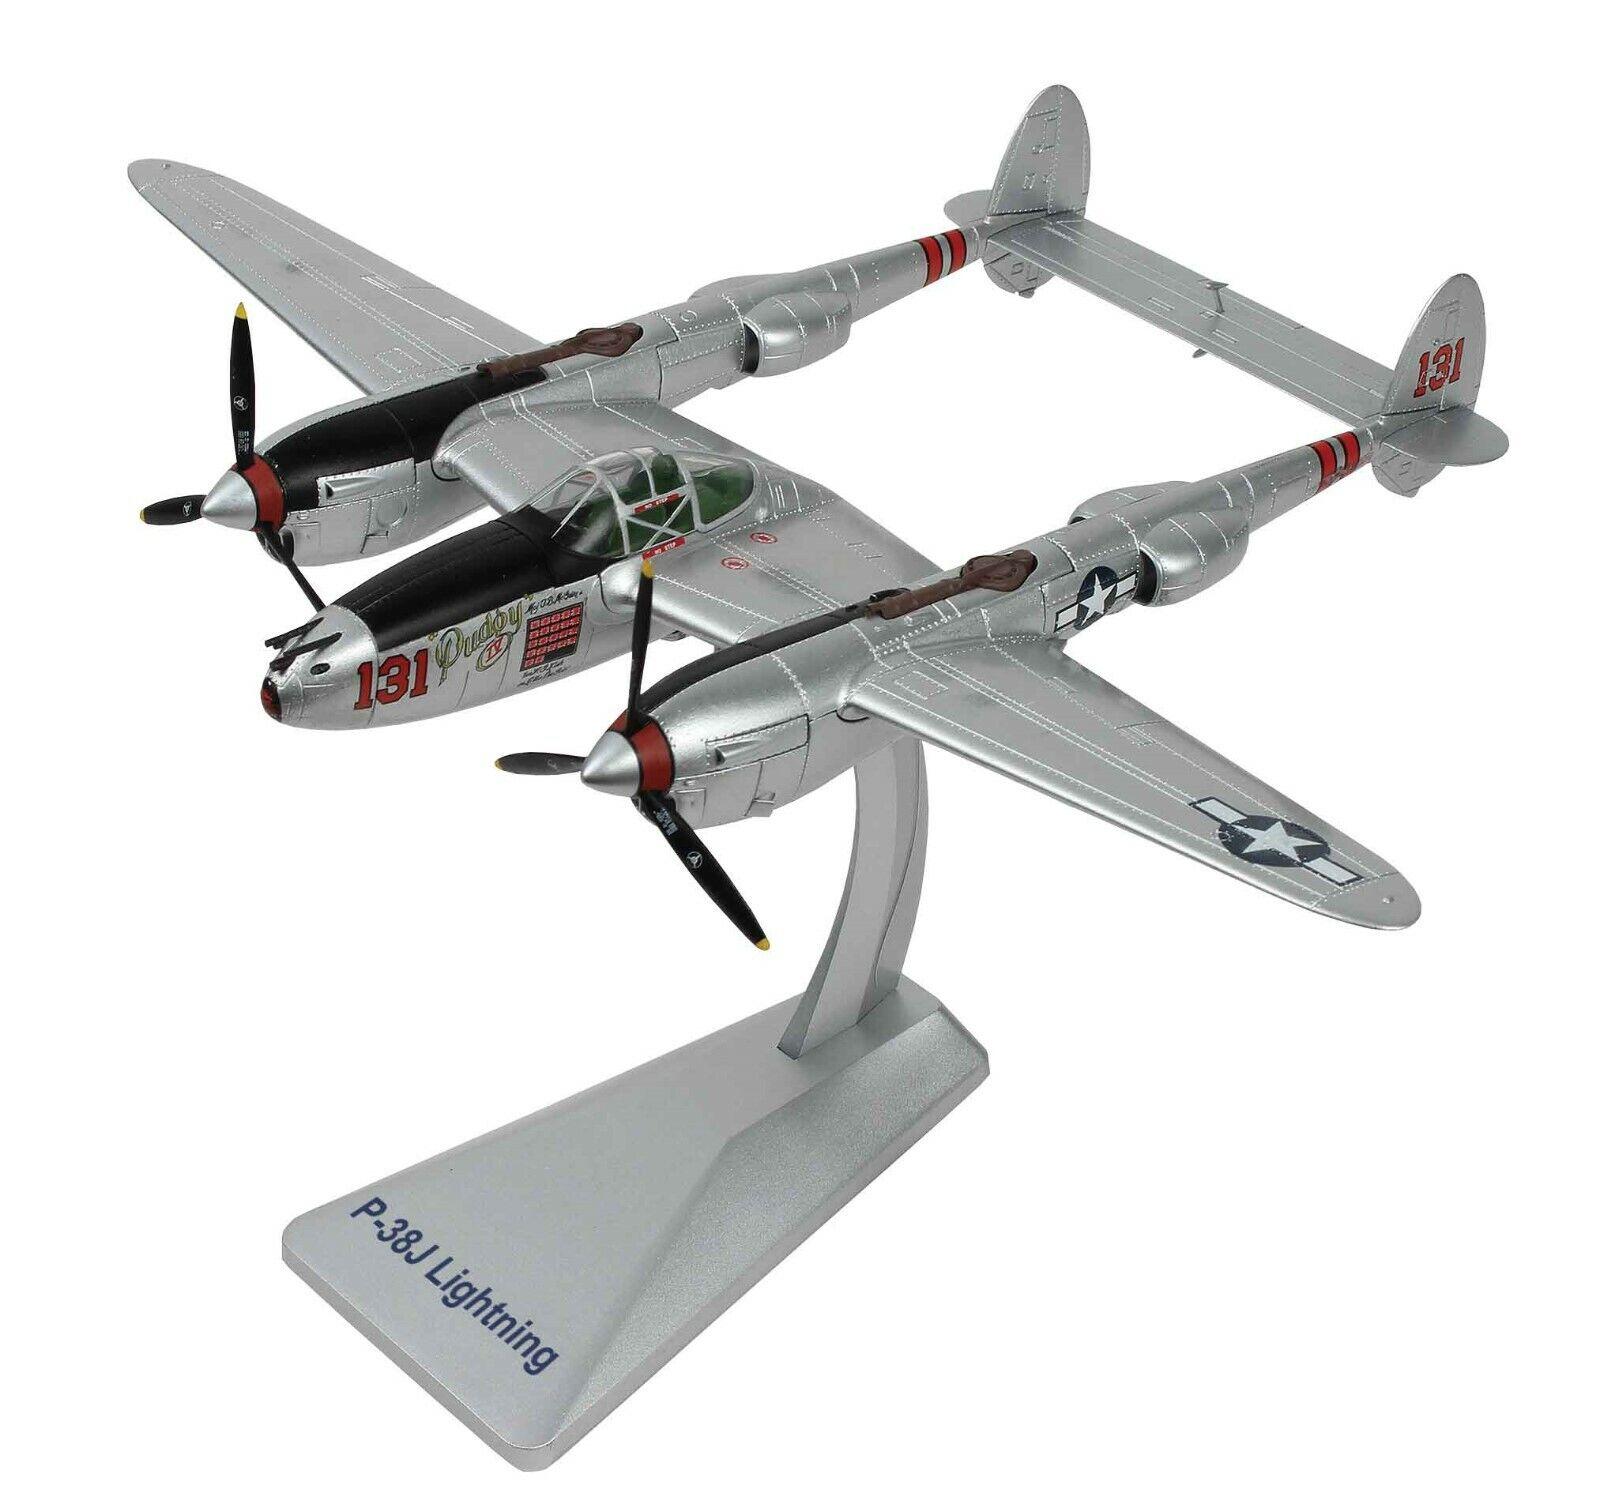 AIRFORCE 1 AF1-0150 1 48 P38j Lightning WWII ACE McGuire  Pudgy IV  fighter